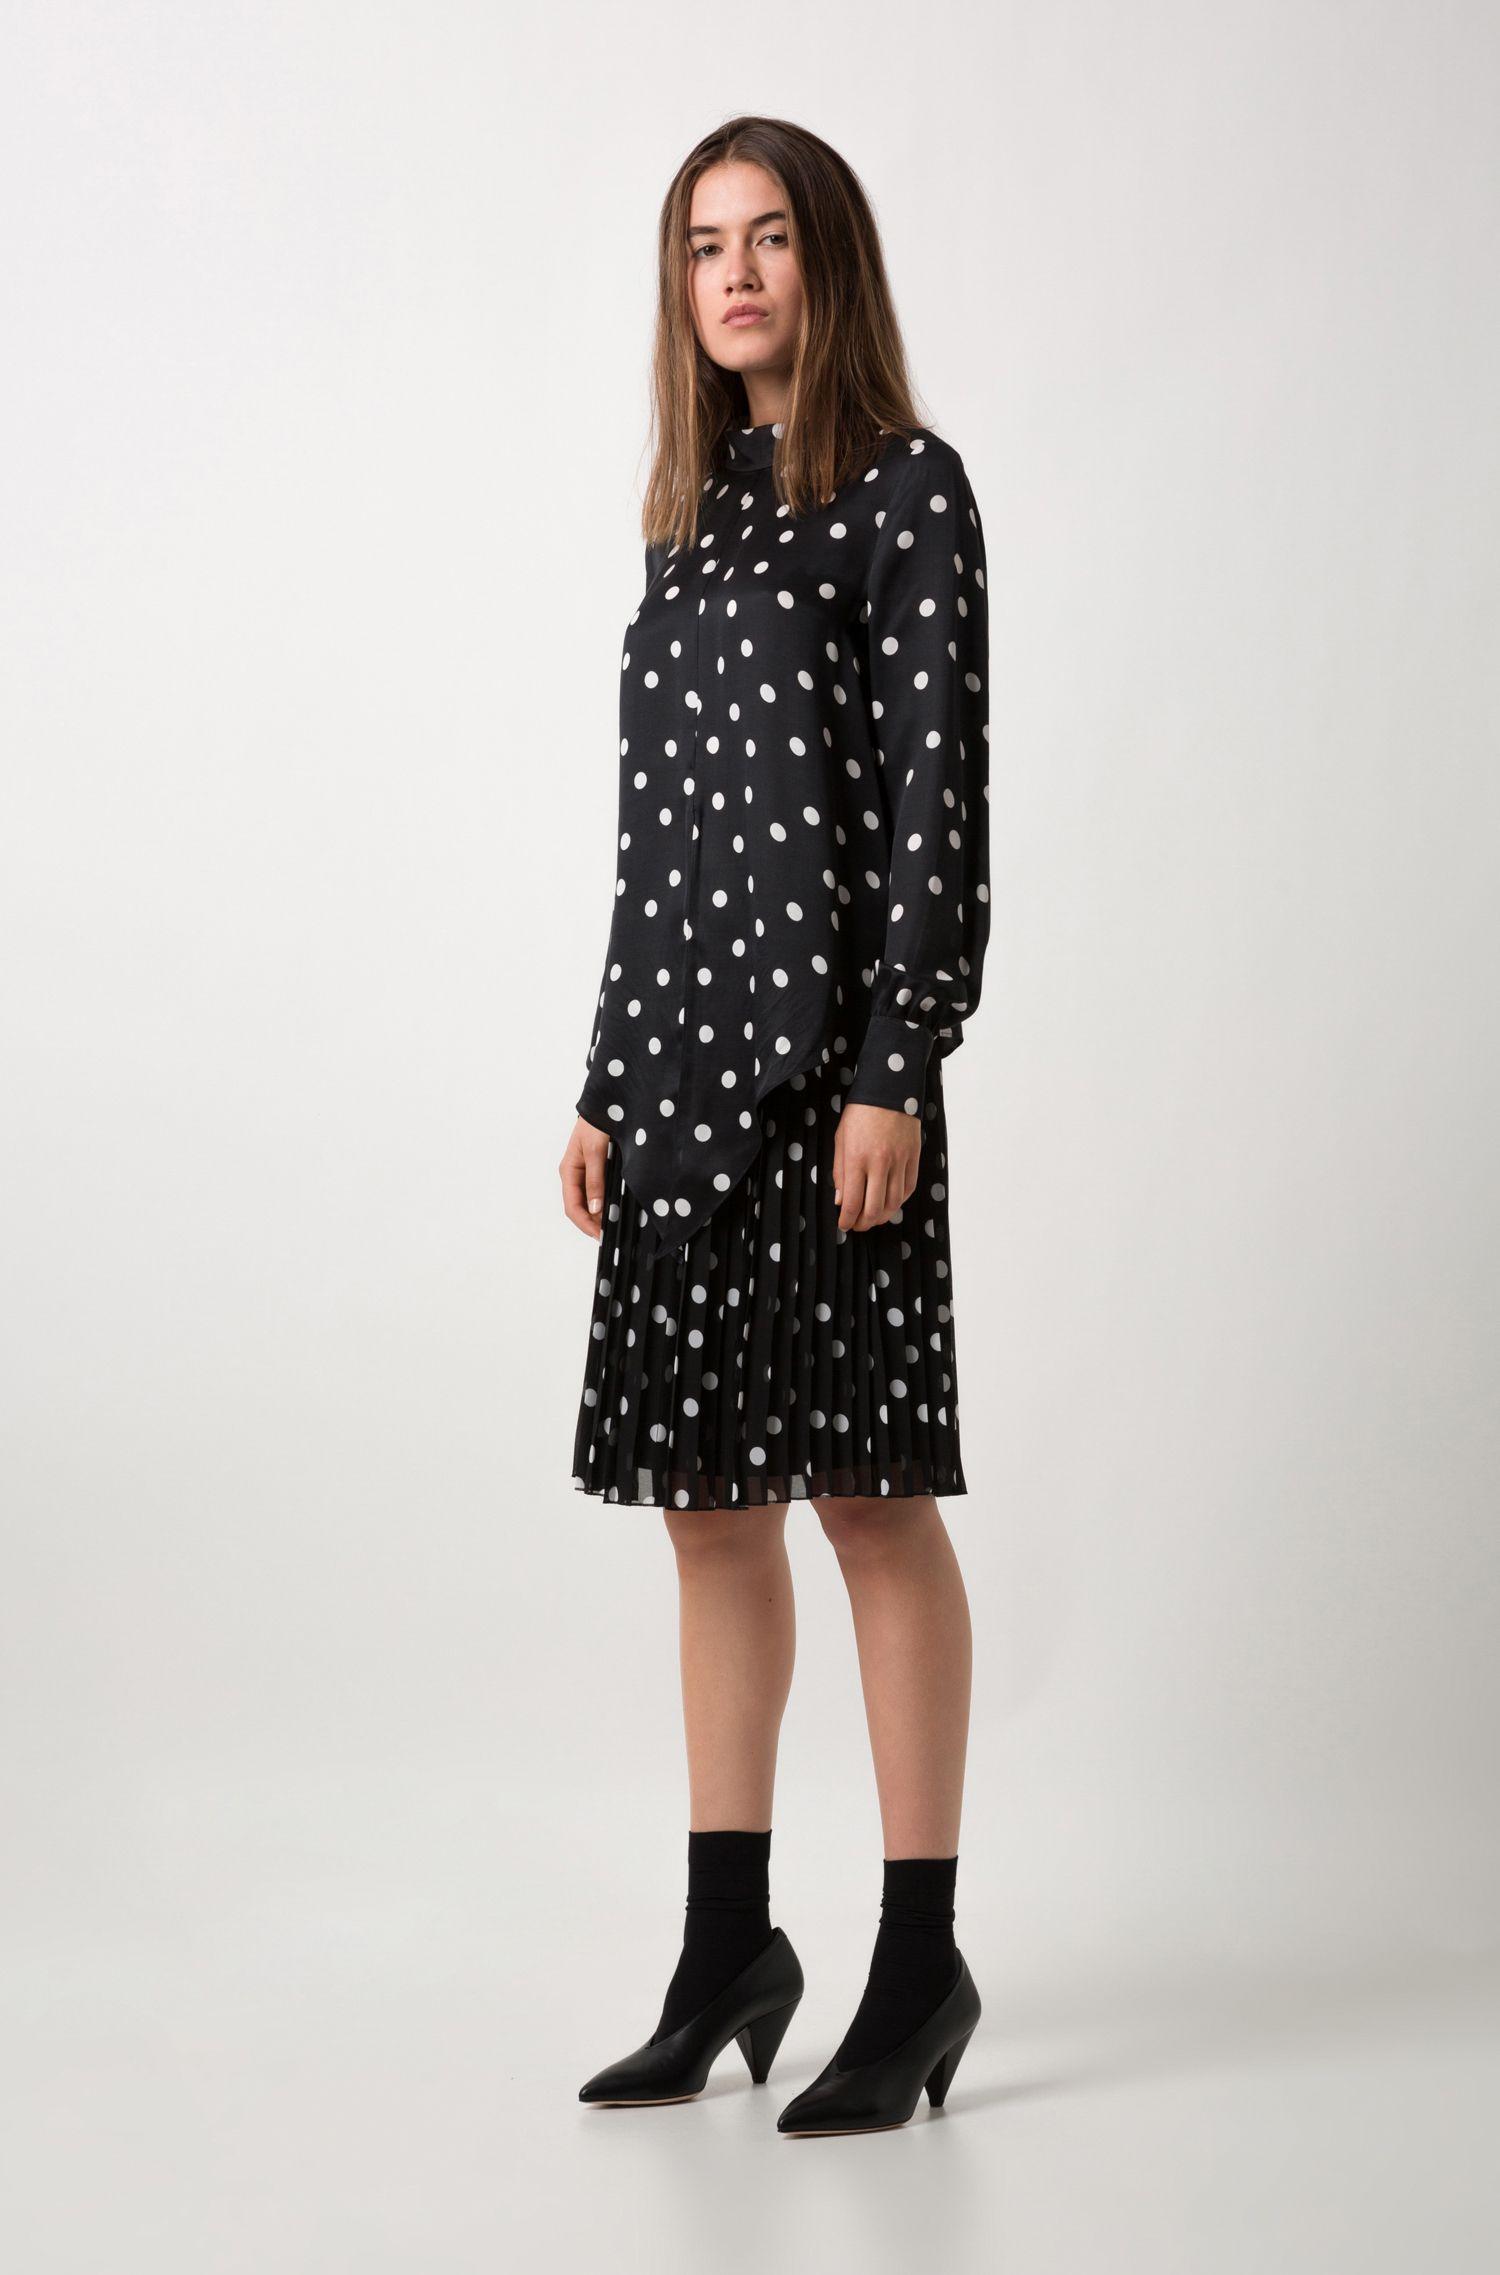 Spot-print plissé skirt with elasticated waistband, Patterned